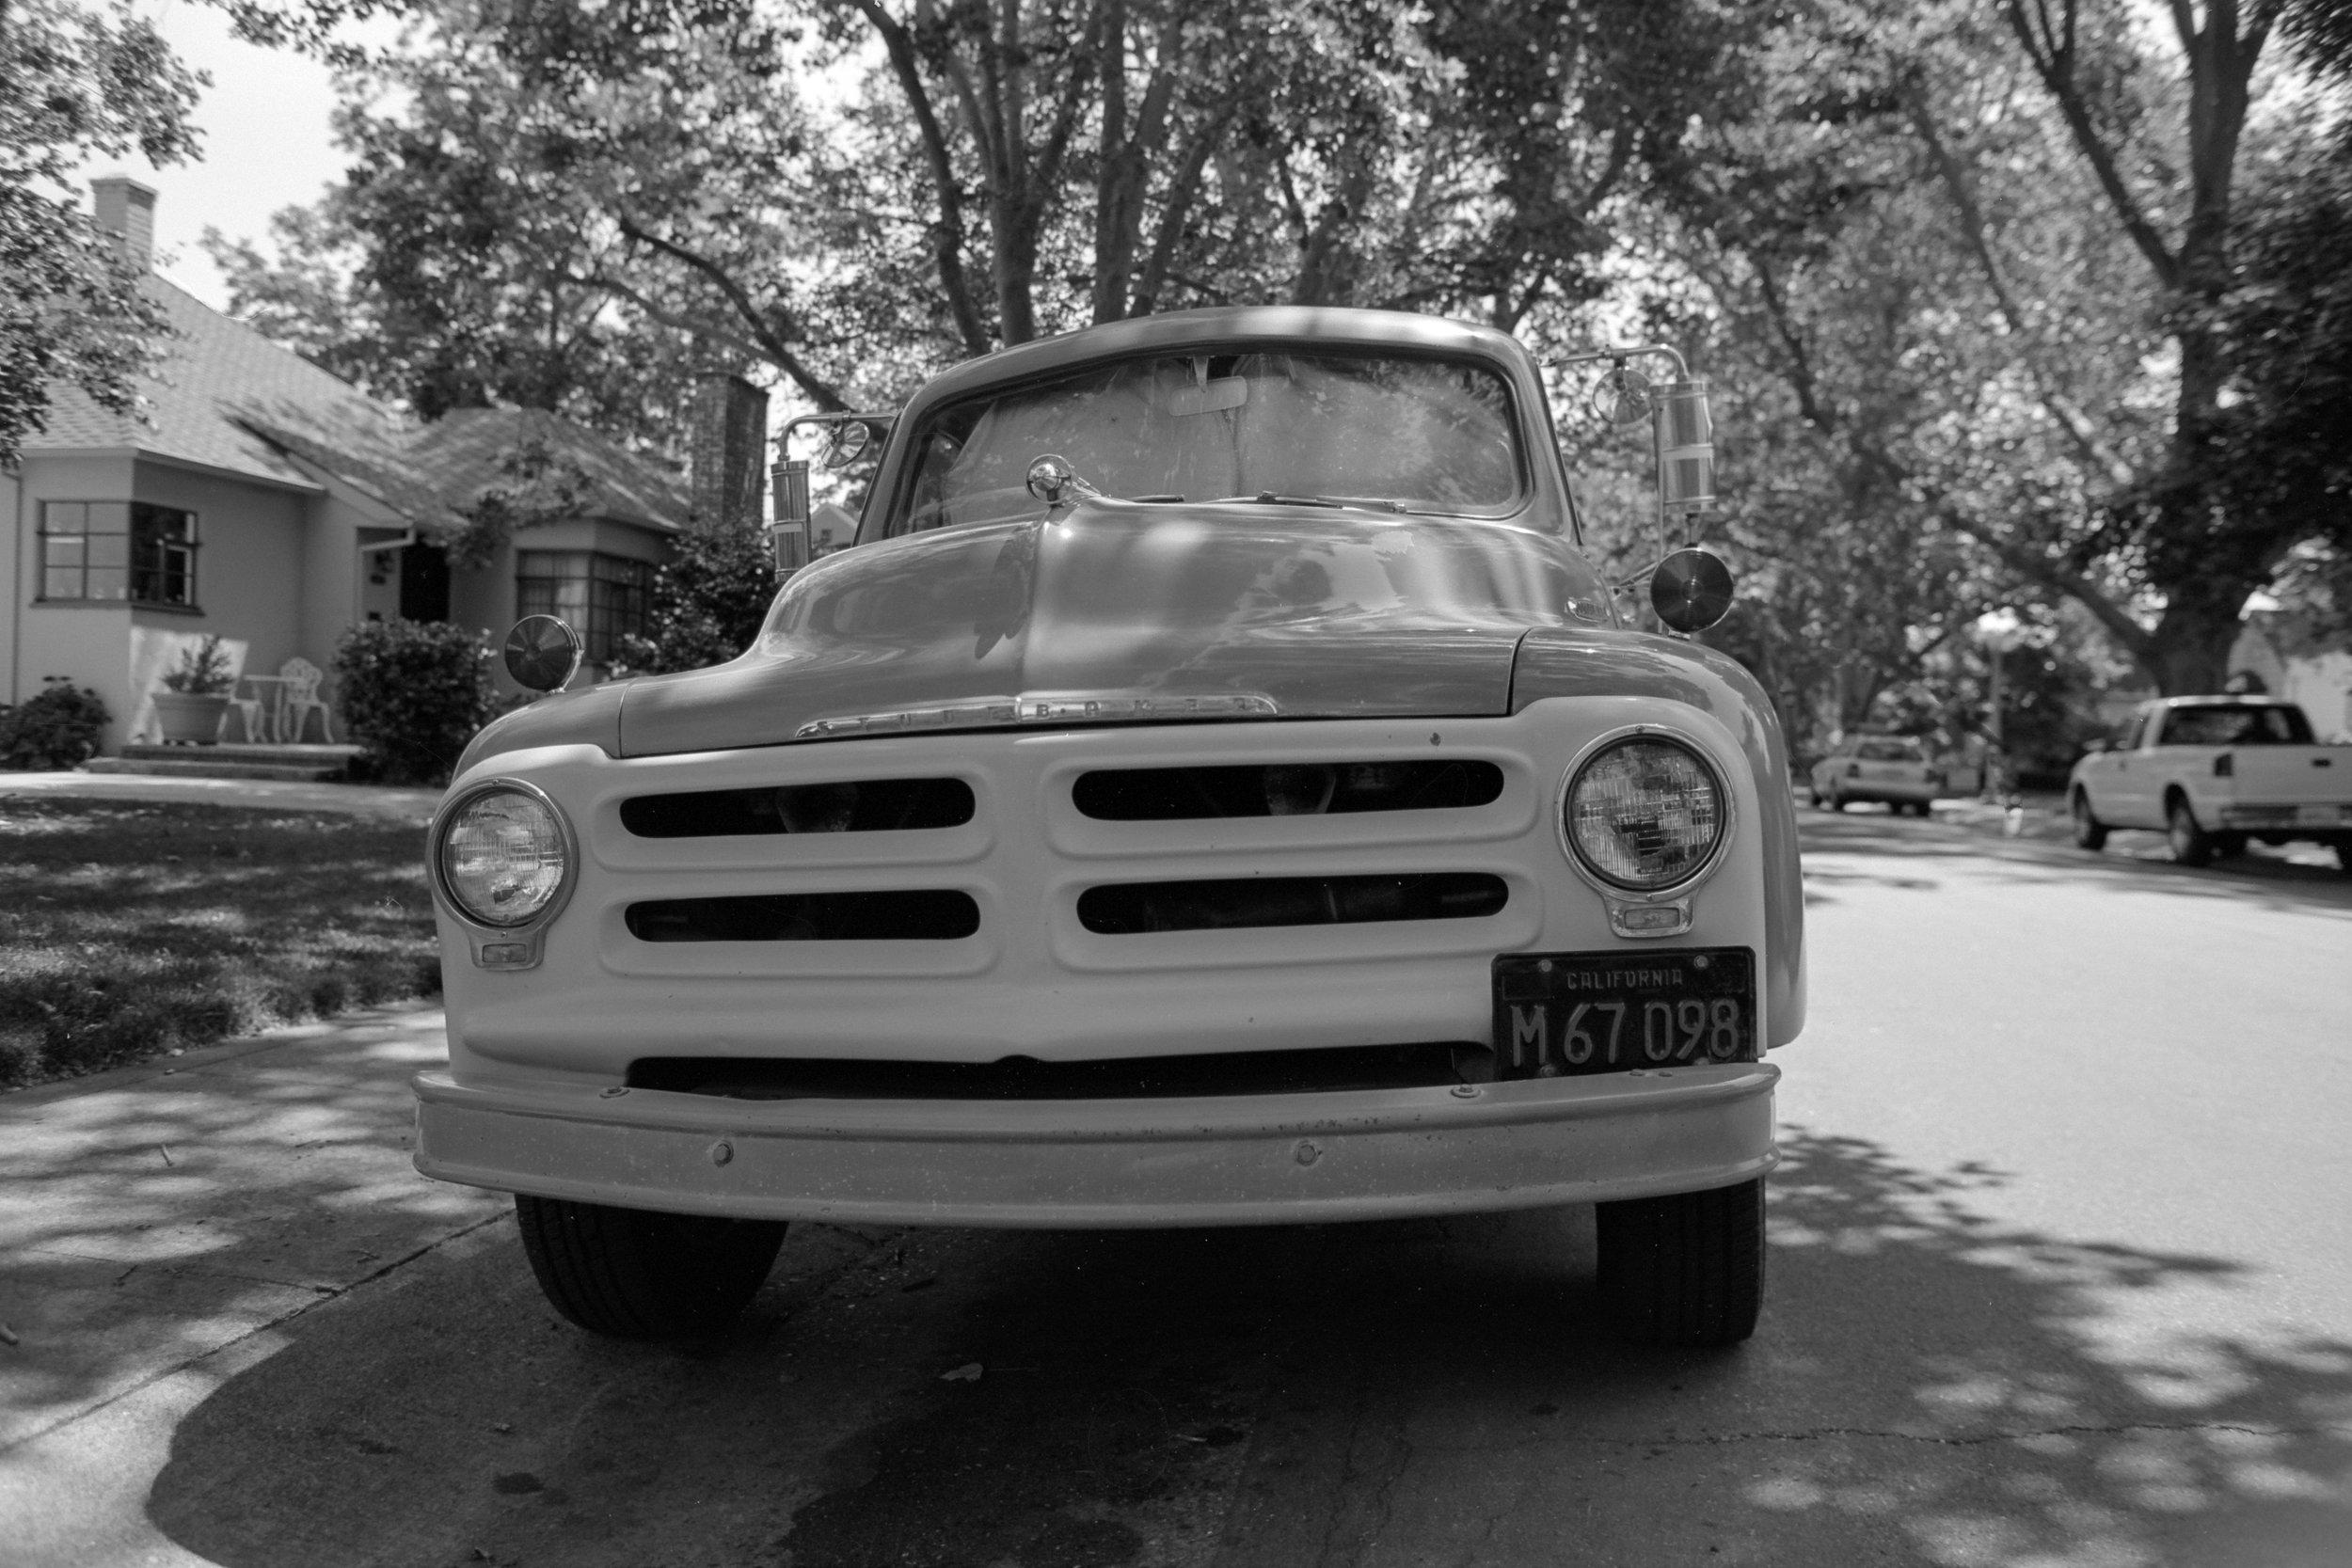 ScottMicciche-OldTruck.jpg